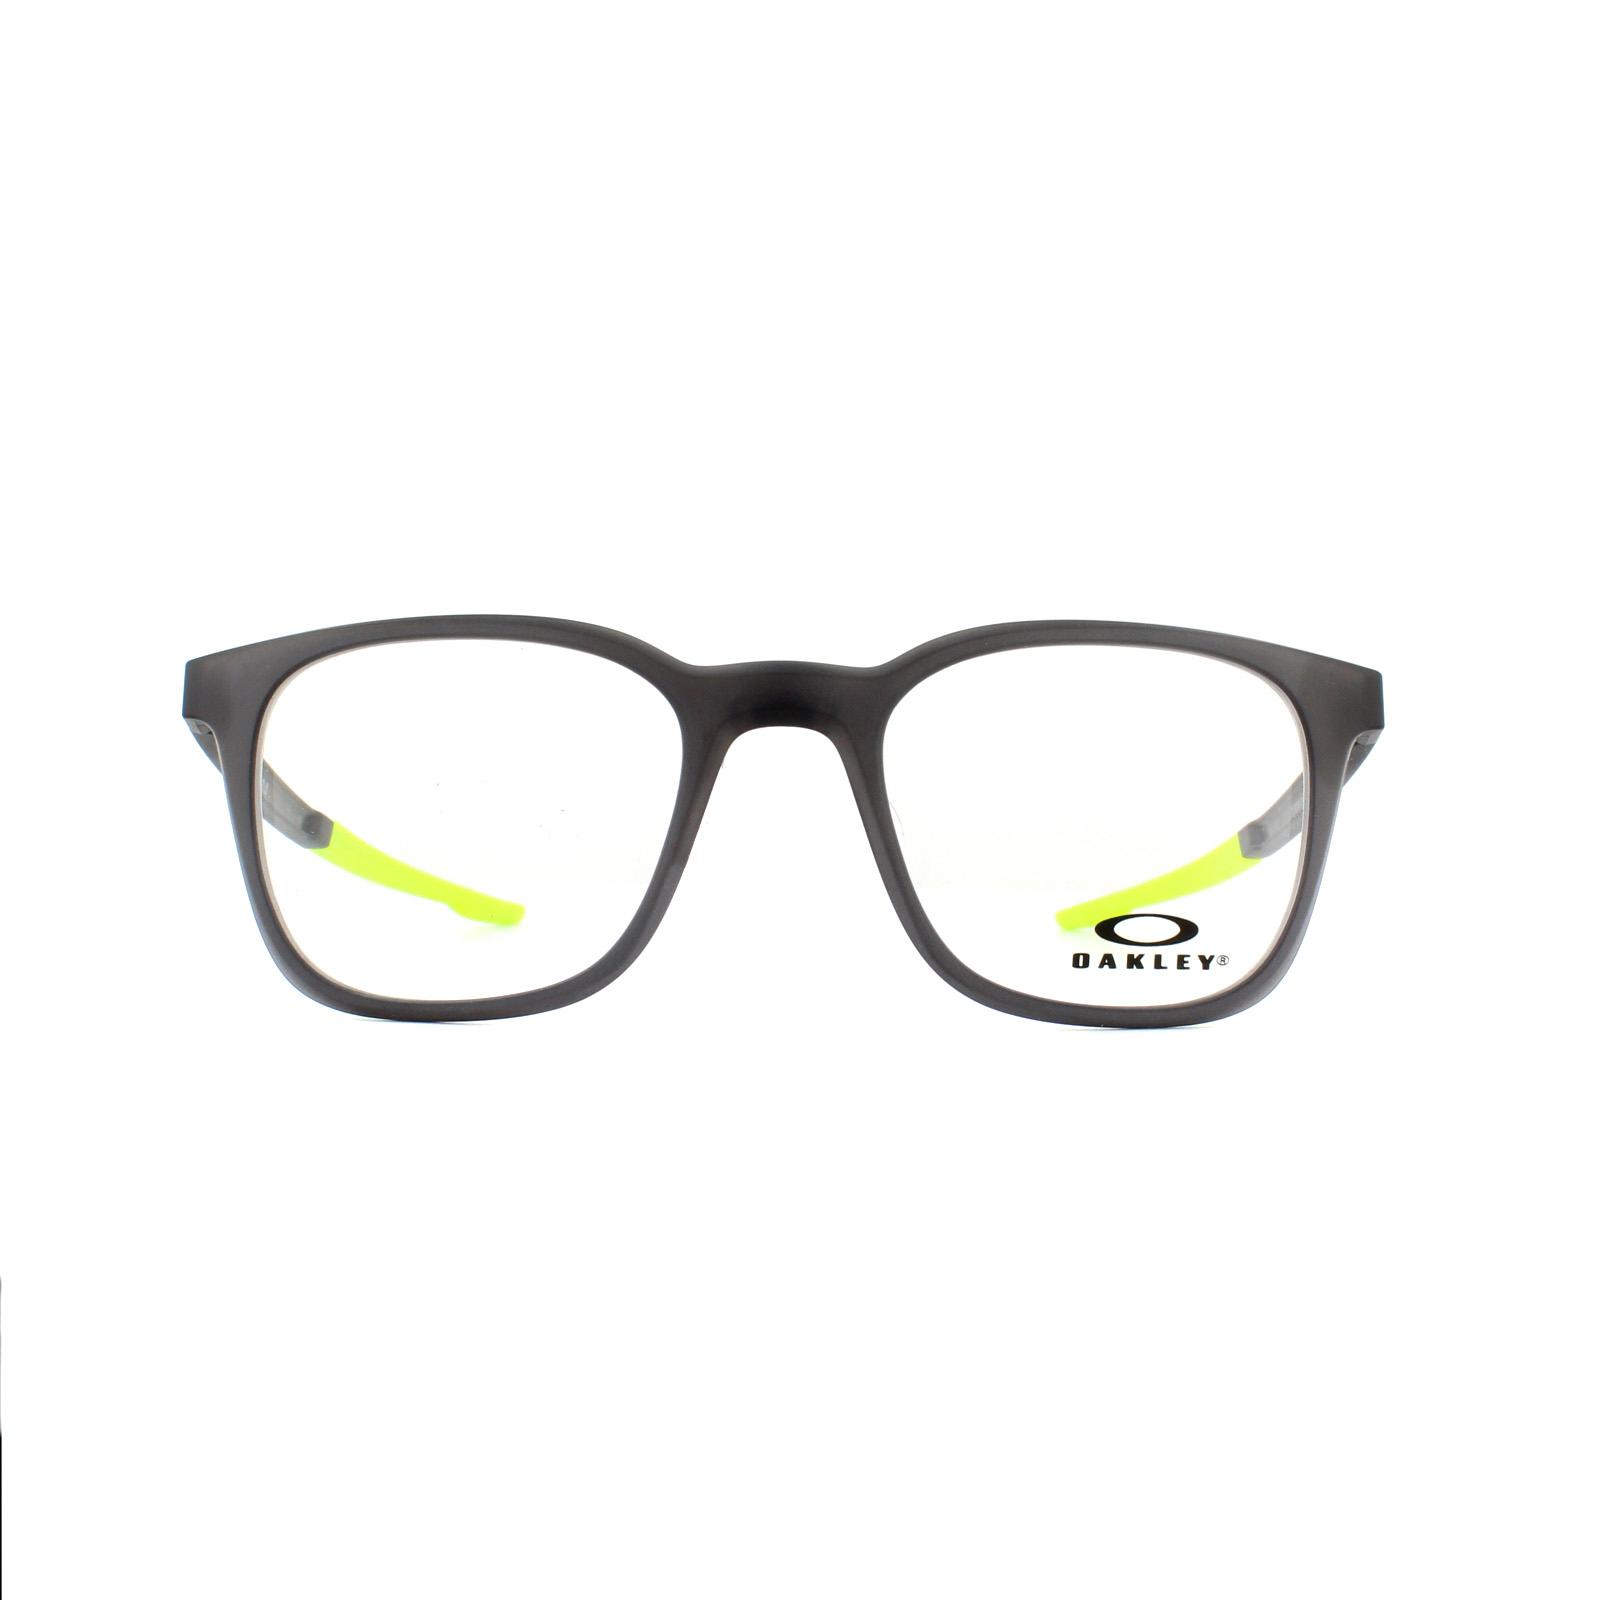 0f012e5eea46 Cheap Oakley 8093 Milestone 3.0 Glasses Frames - Discounted Sunglasses